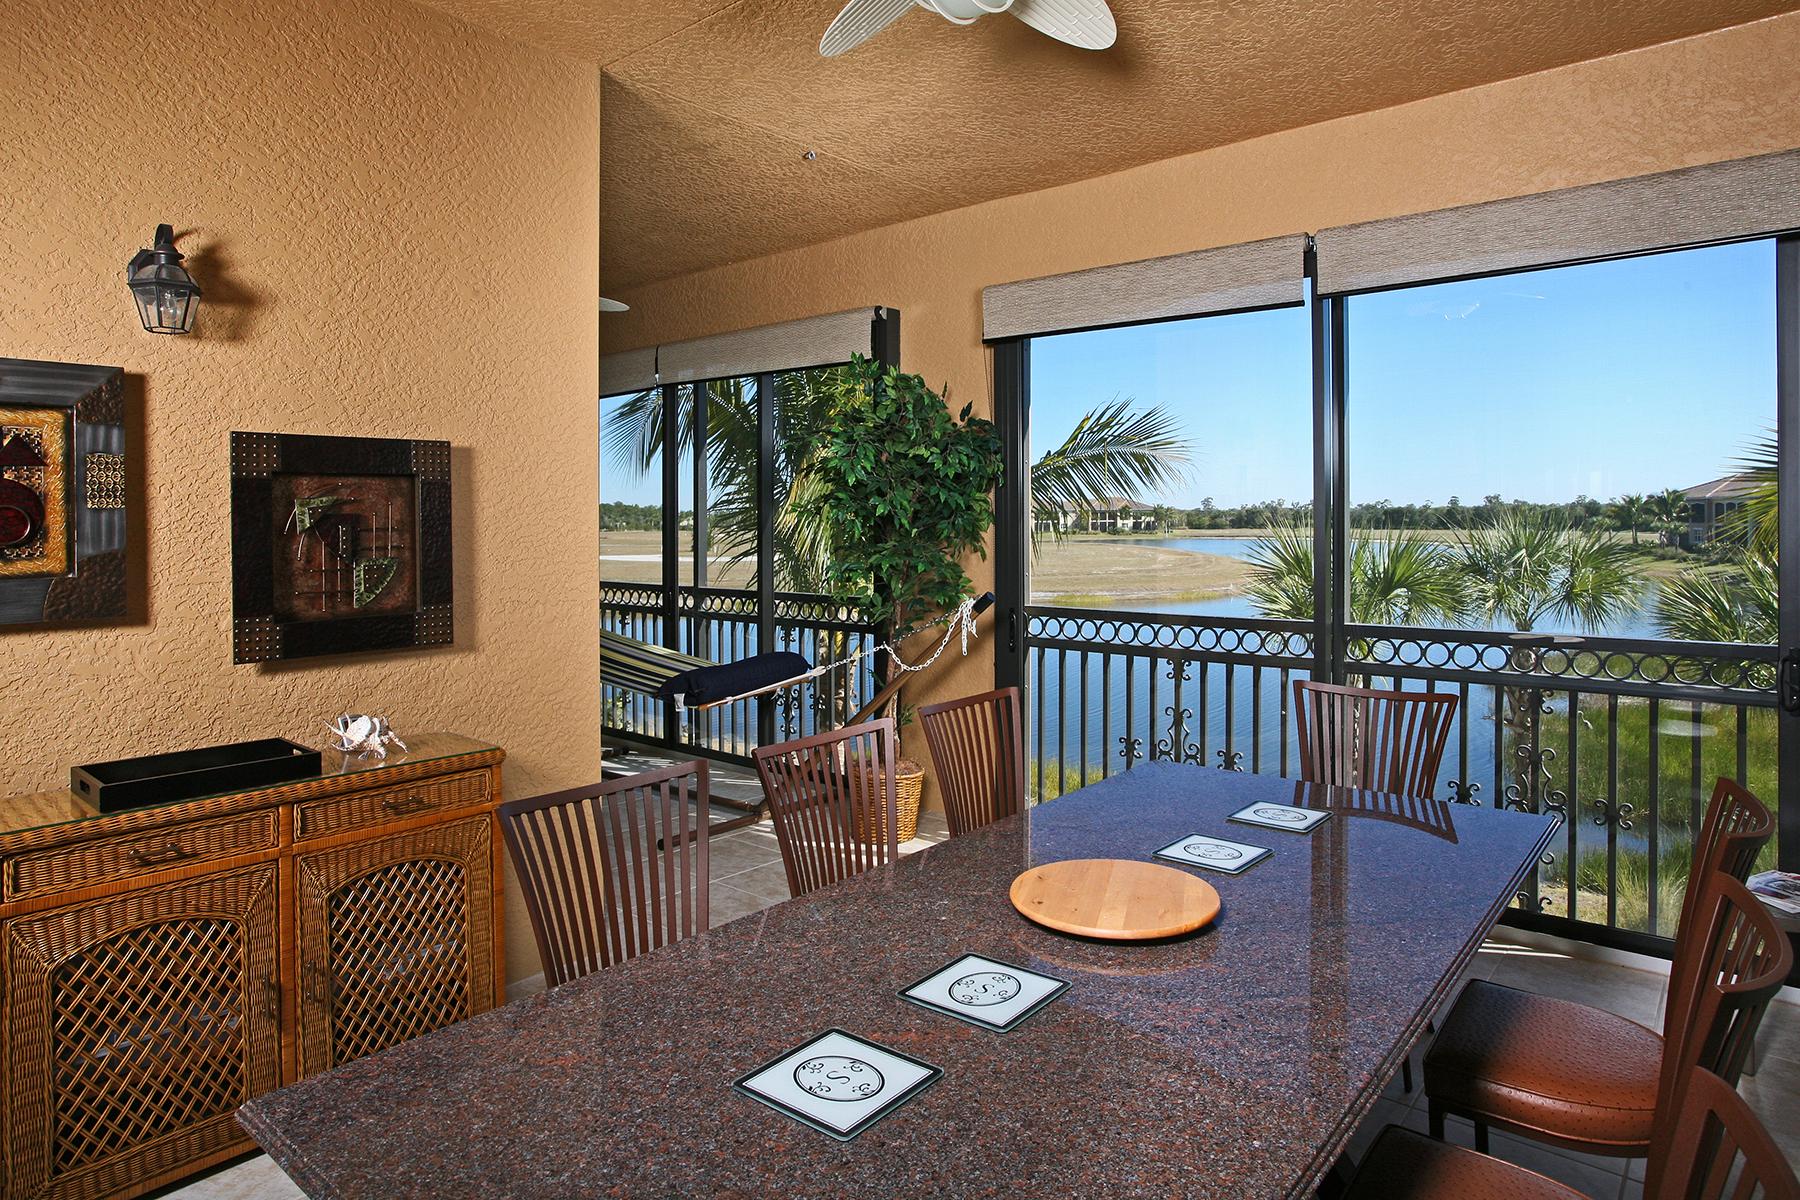 Nhà chung cư vì Bán tại FIDDLER'S CREEK - CALLISTA 2714 Callista Ct 204 Naples, Florida, 34114 Hoa Kỳ